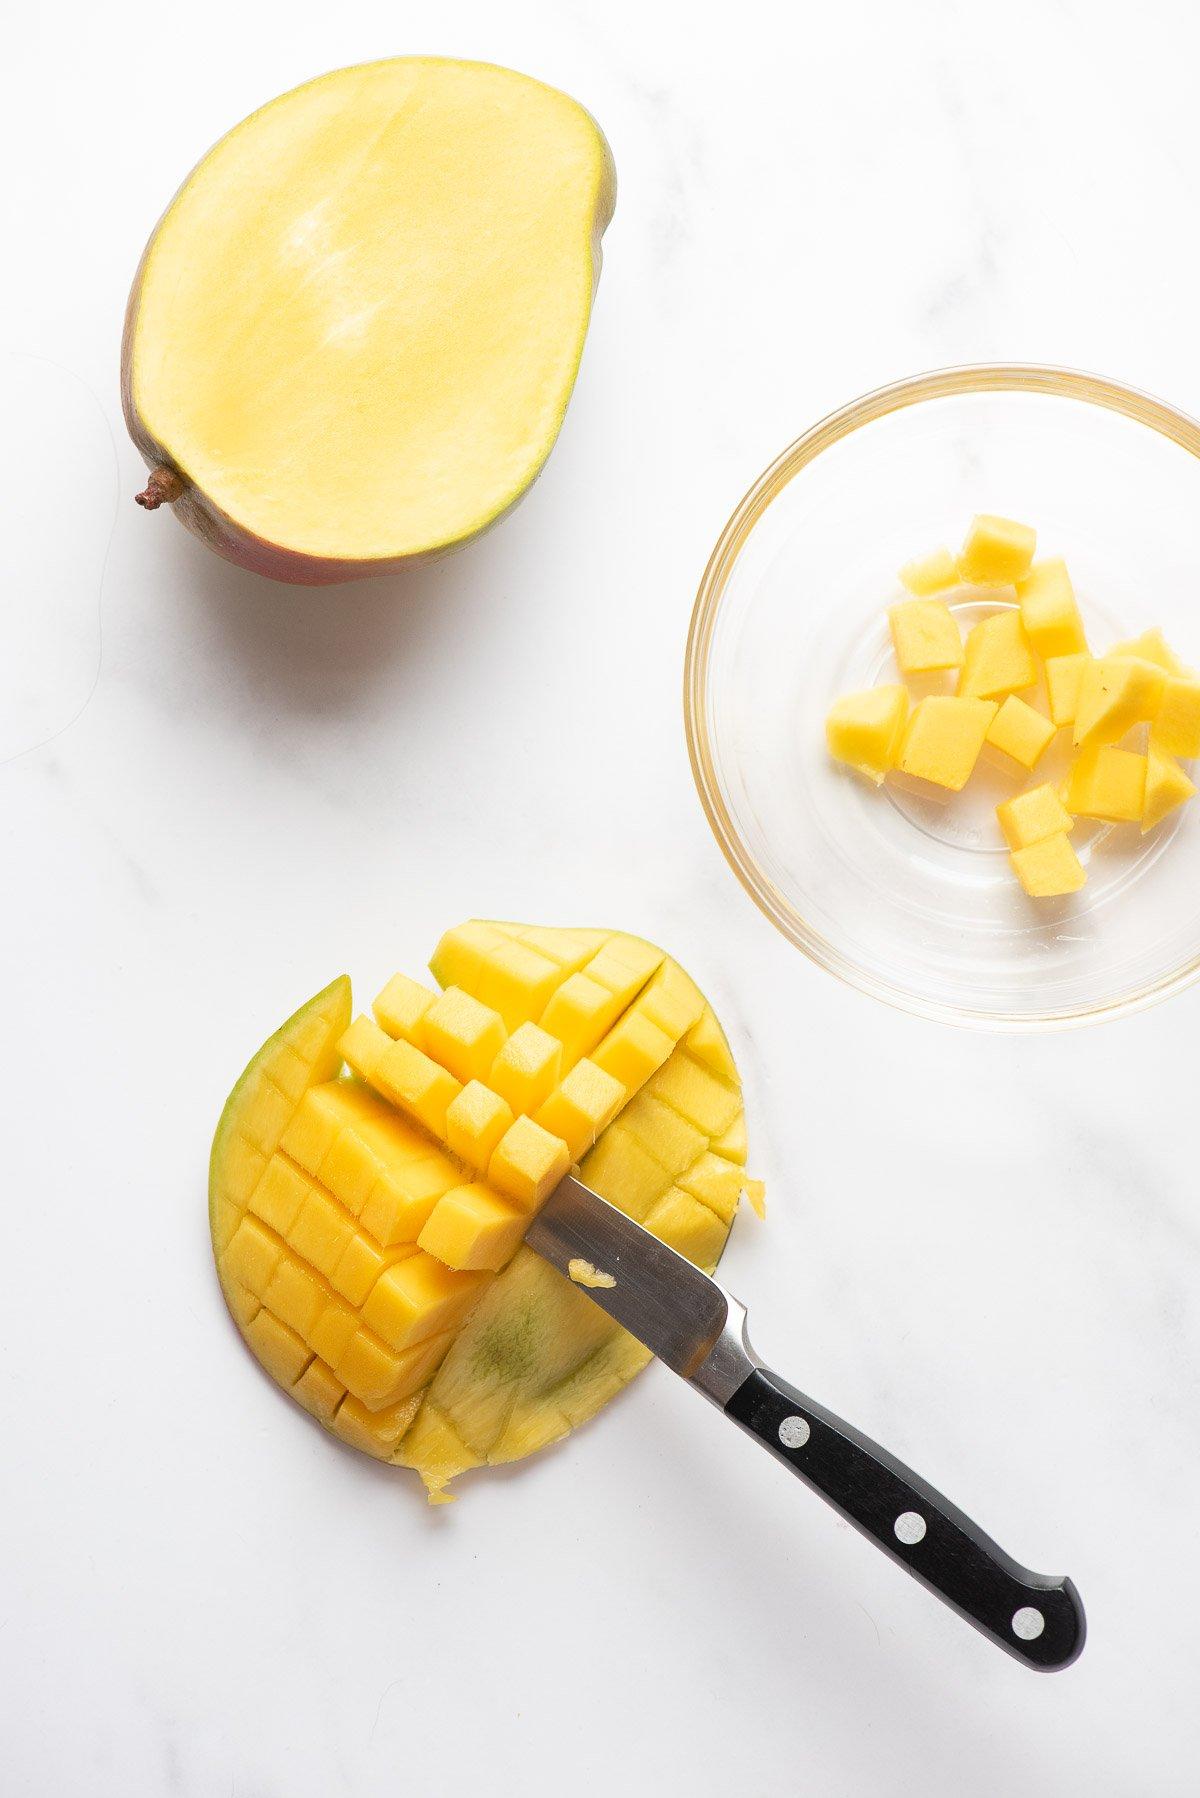 cutting mango fruit from the skin